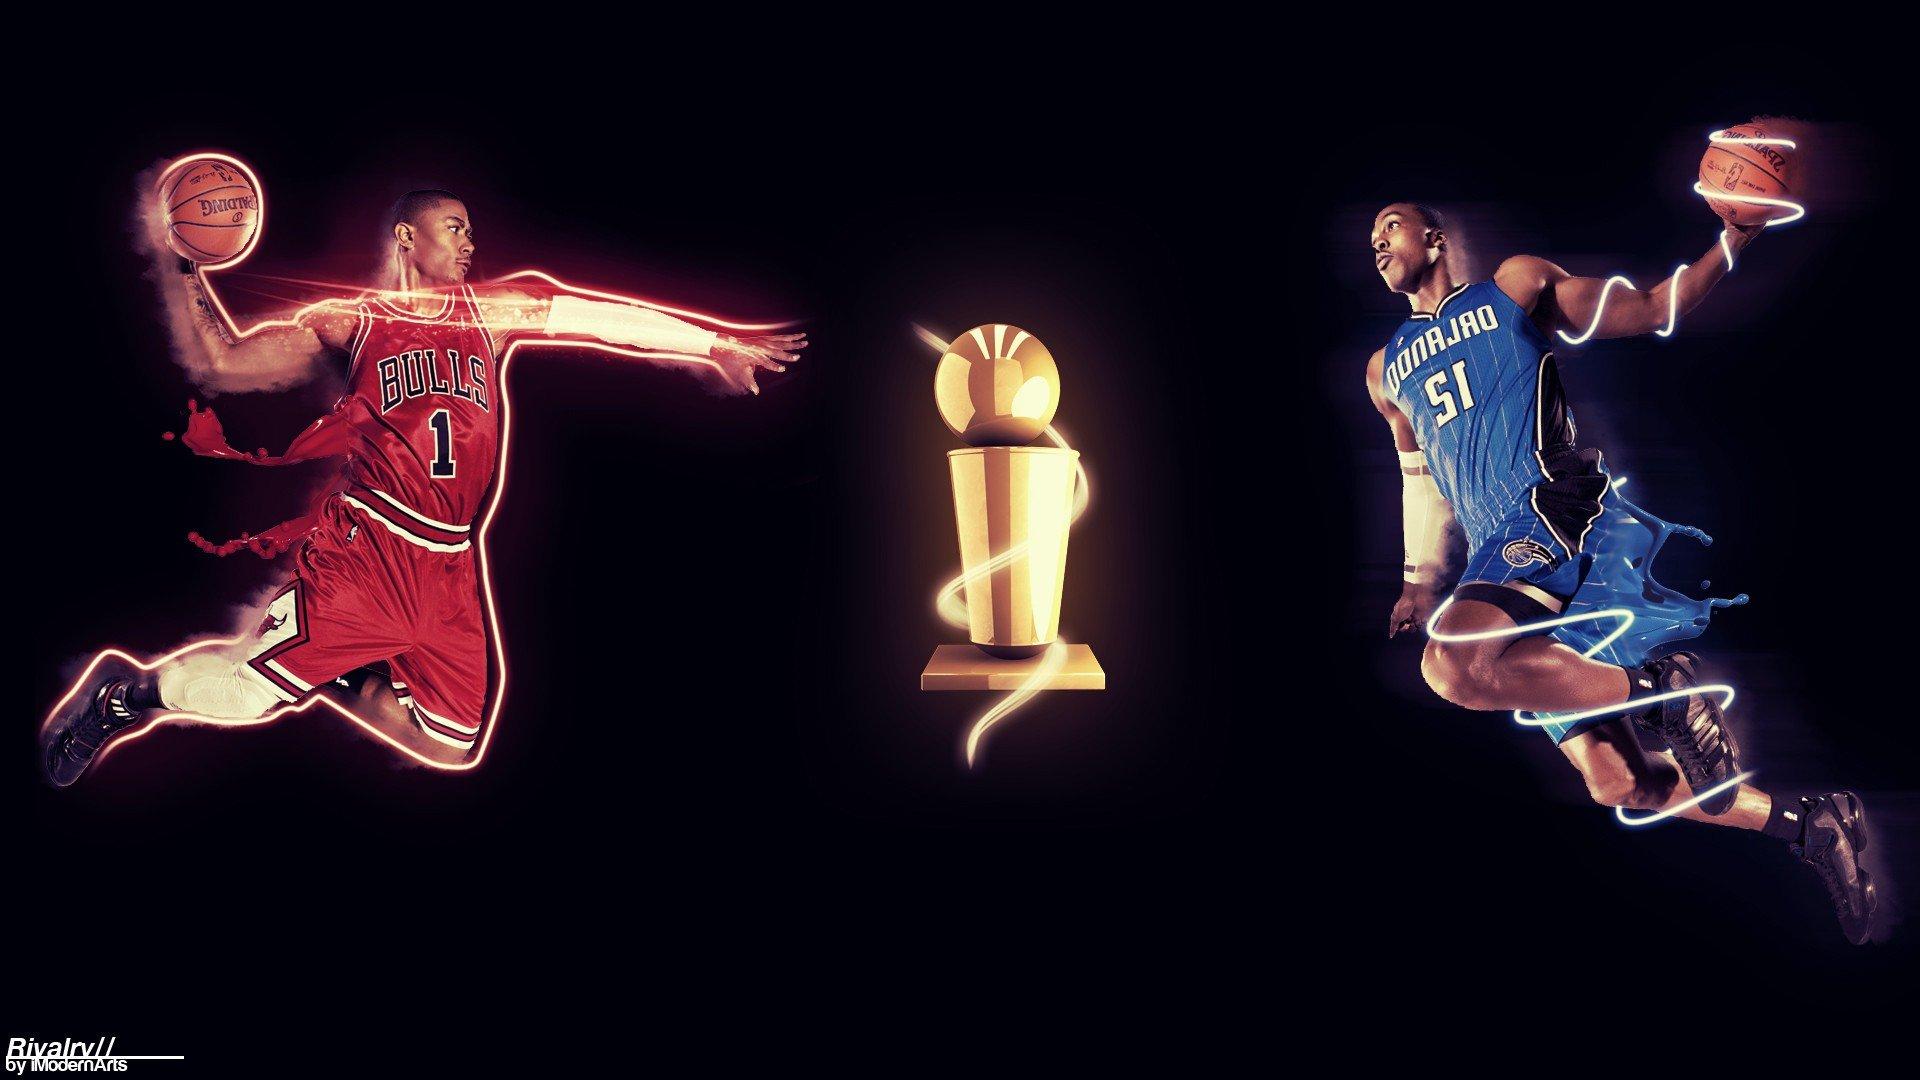 Versus nba basketball chicago bulls orlando magic - Cool nba background ...